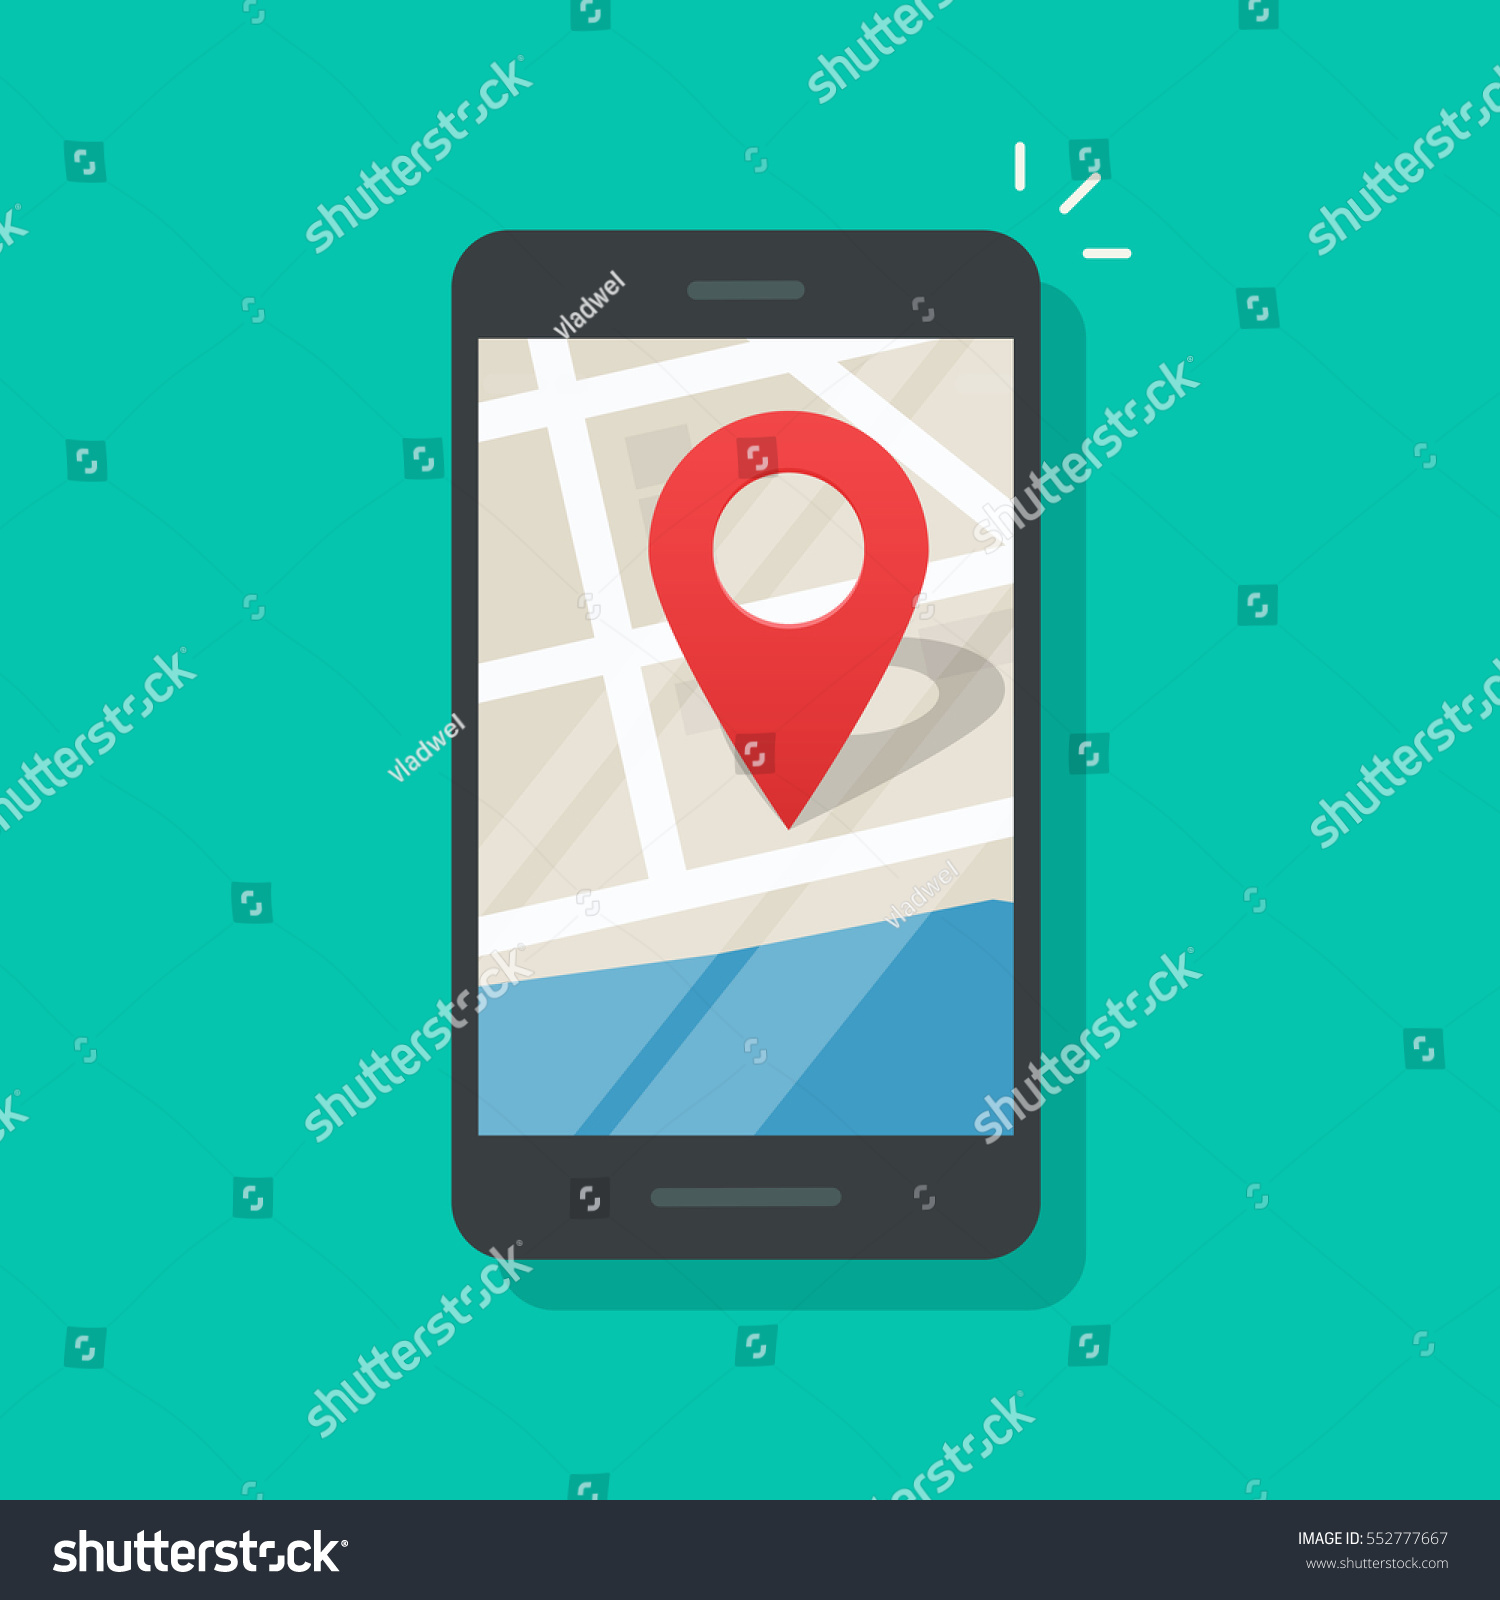 mobile phone geo location smartphone gps image vectorielle 552777667 shutterstock. Black Bedroom Furniture Sets. Home Design Ideas